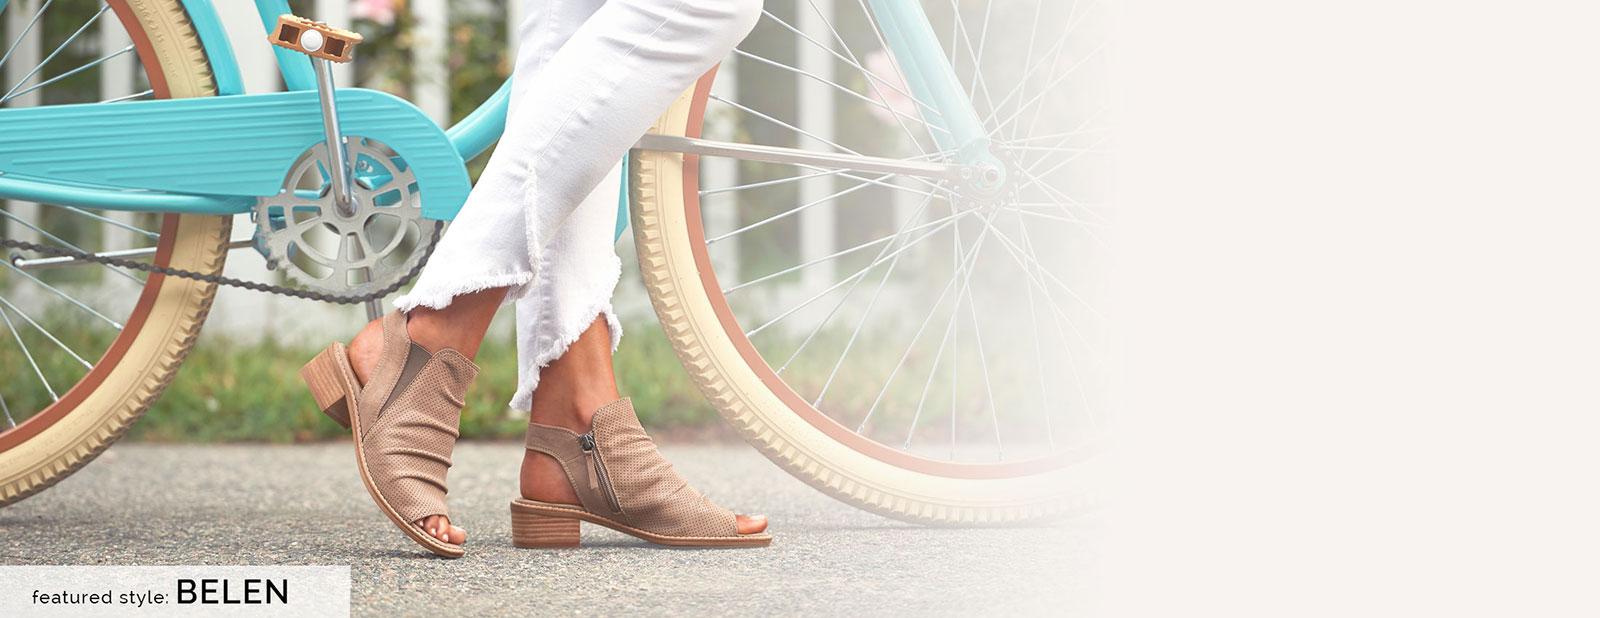 Featured style: Belen sandal in grey